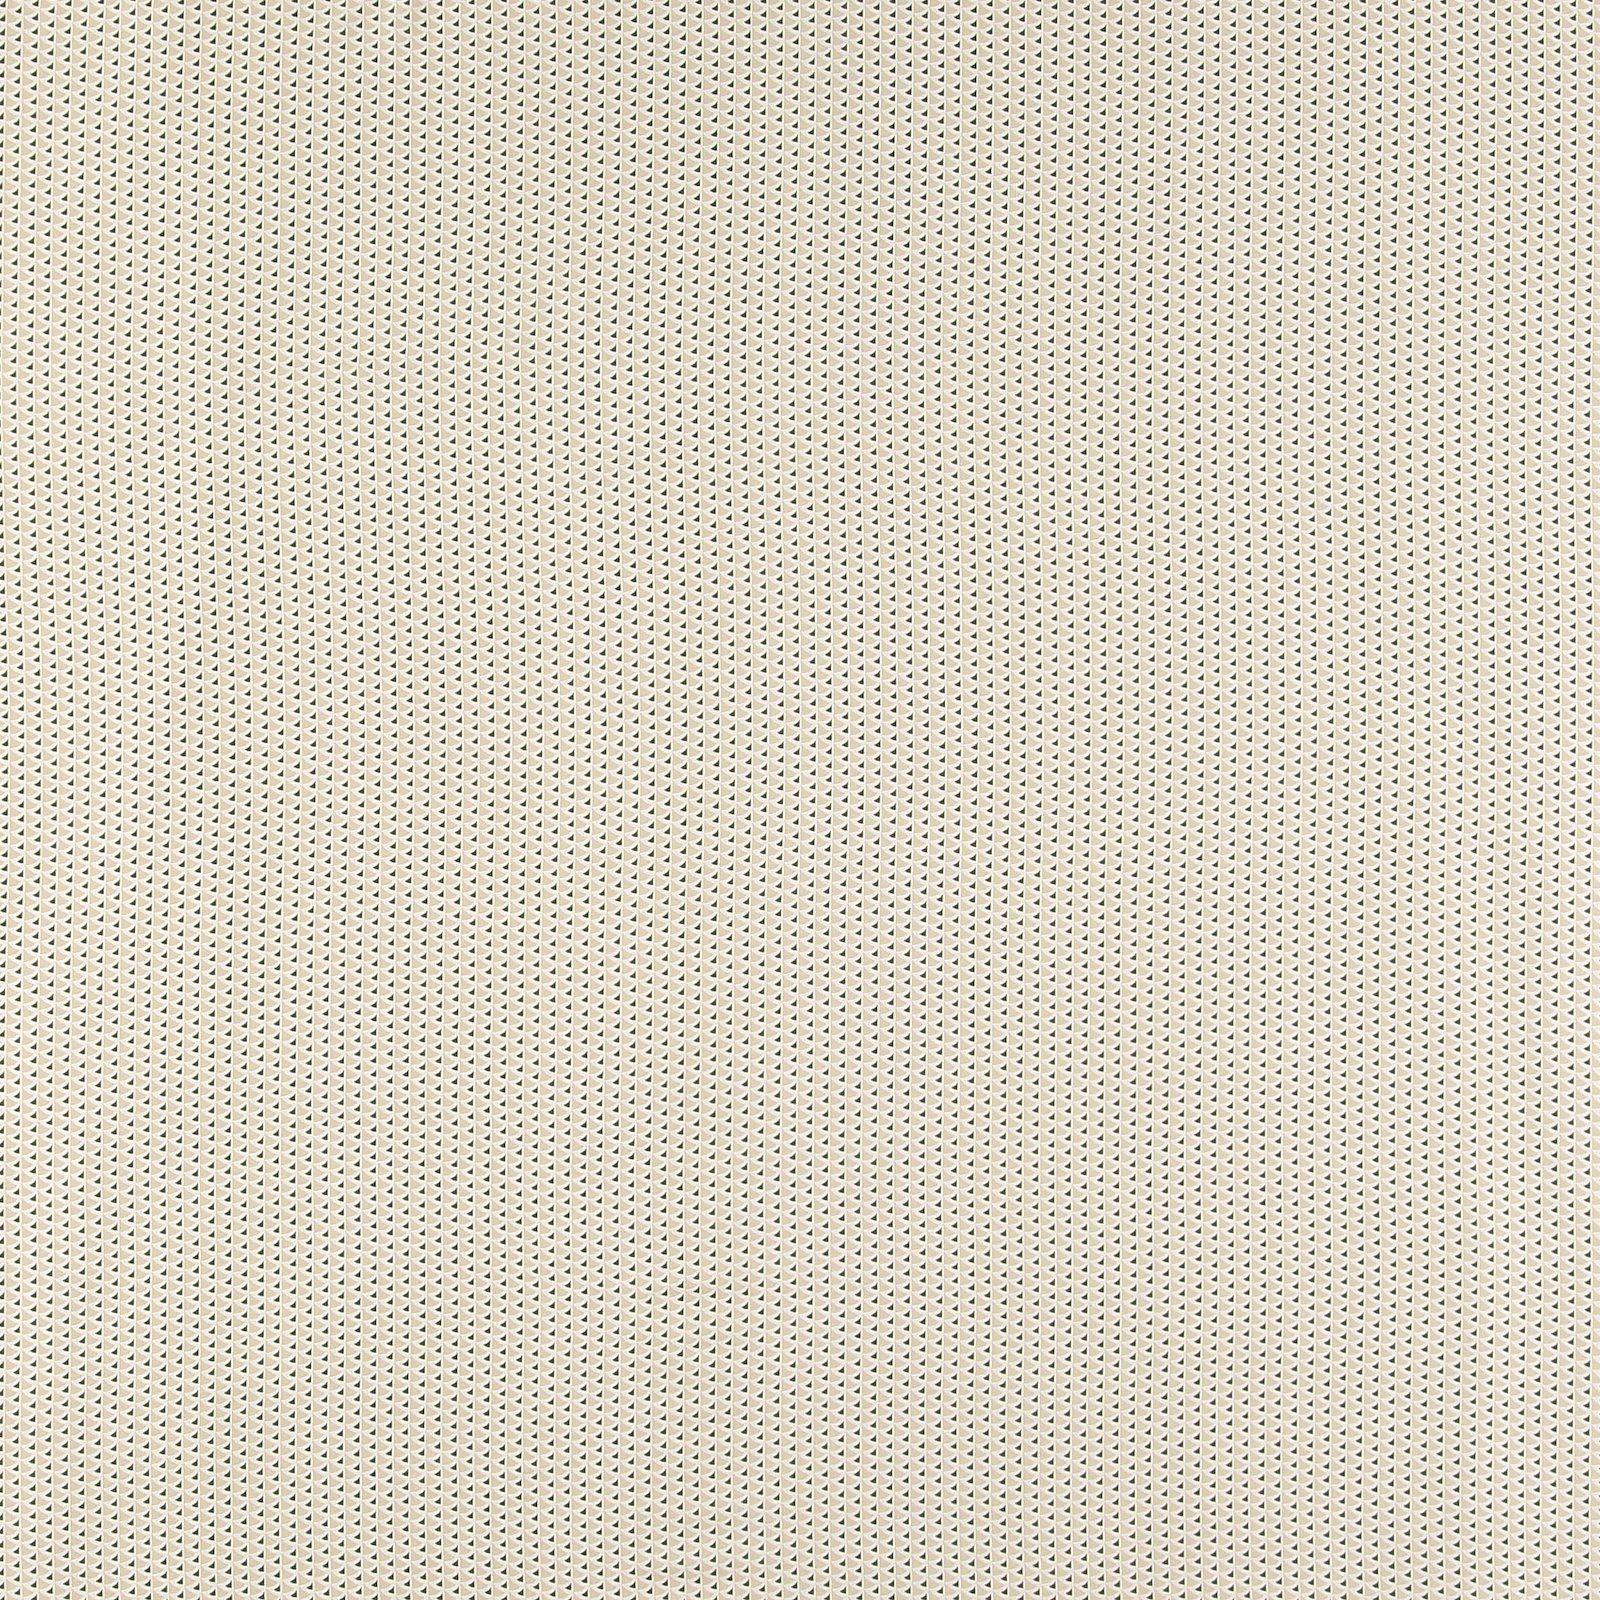 Ecovero Viskose gewebt, Sand, graf.Print 710692_pack_sp